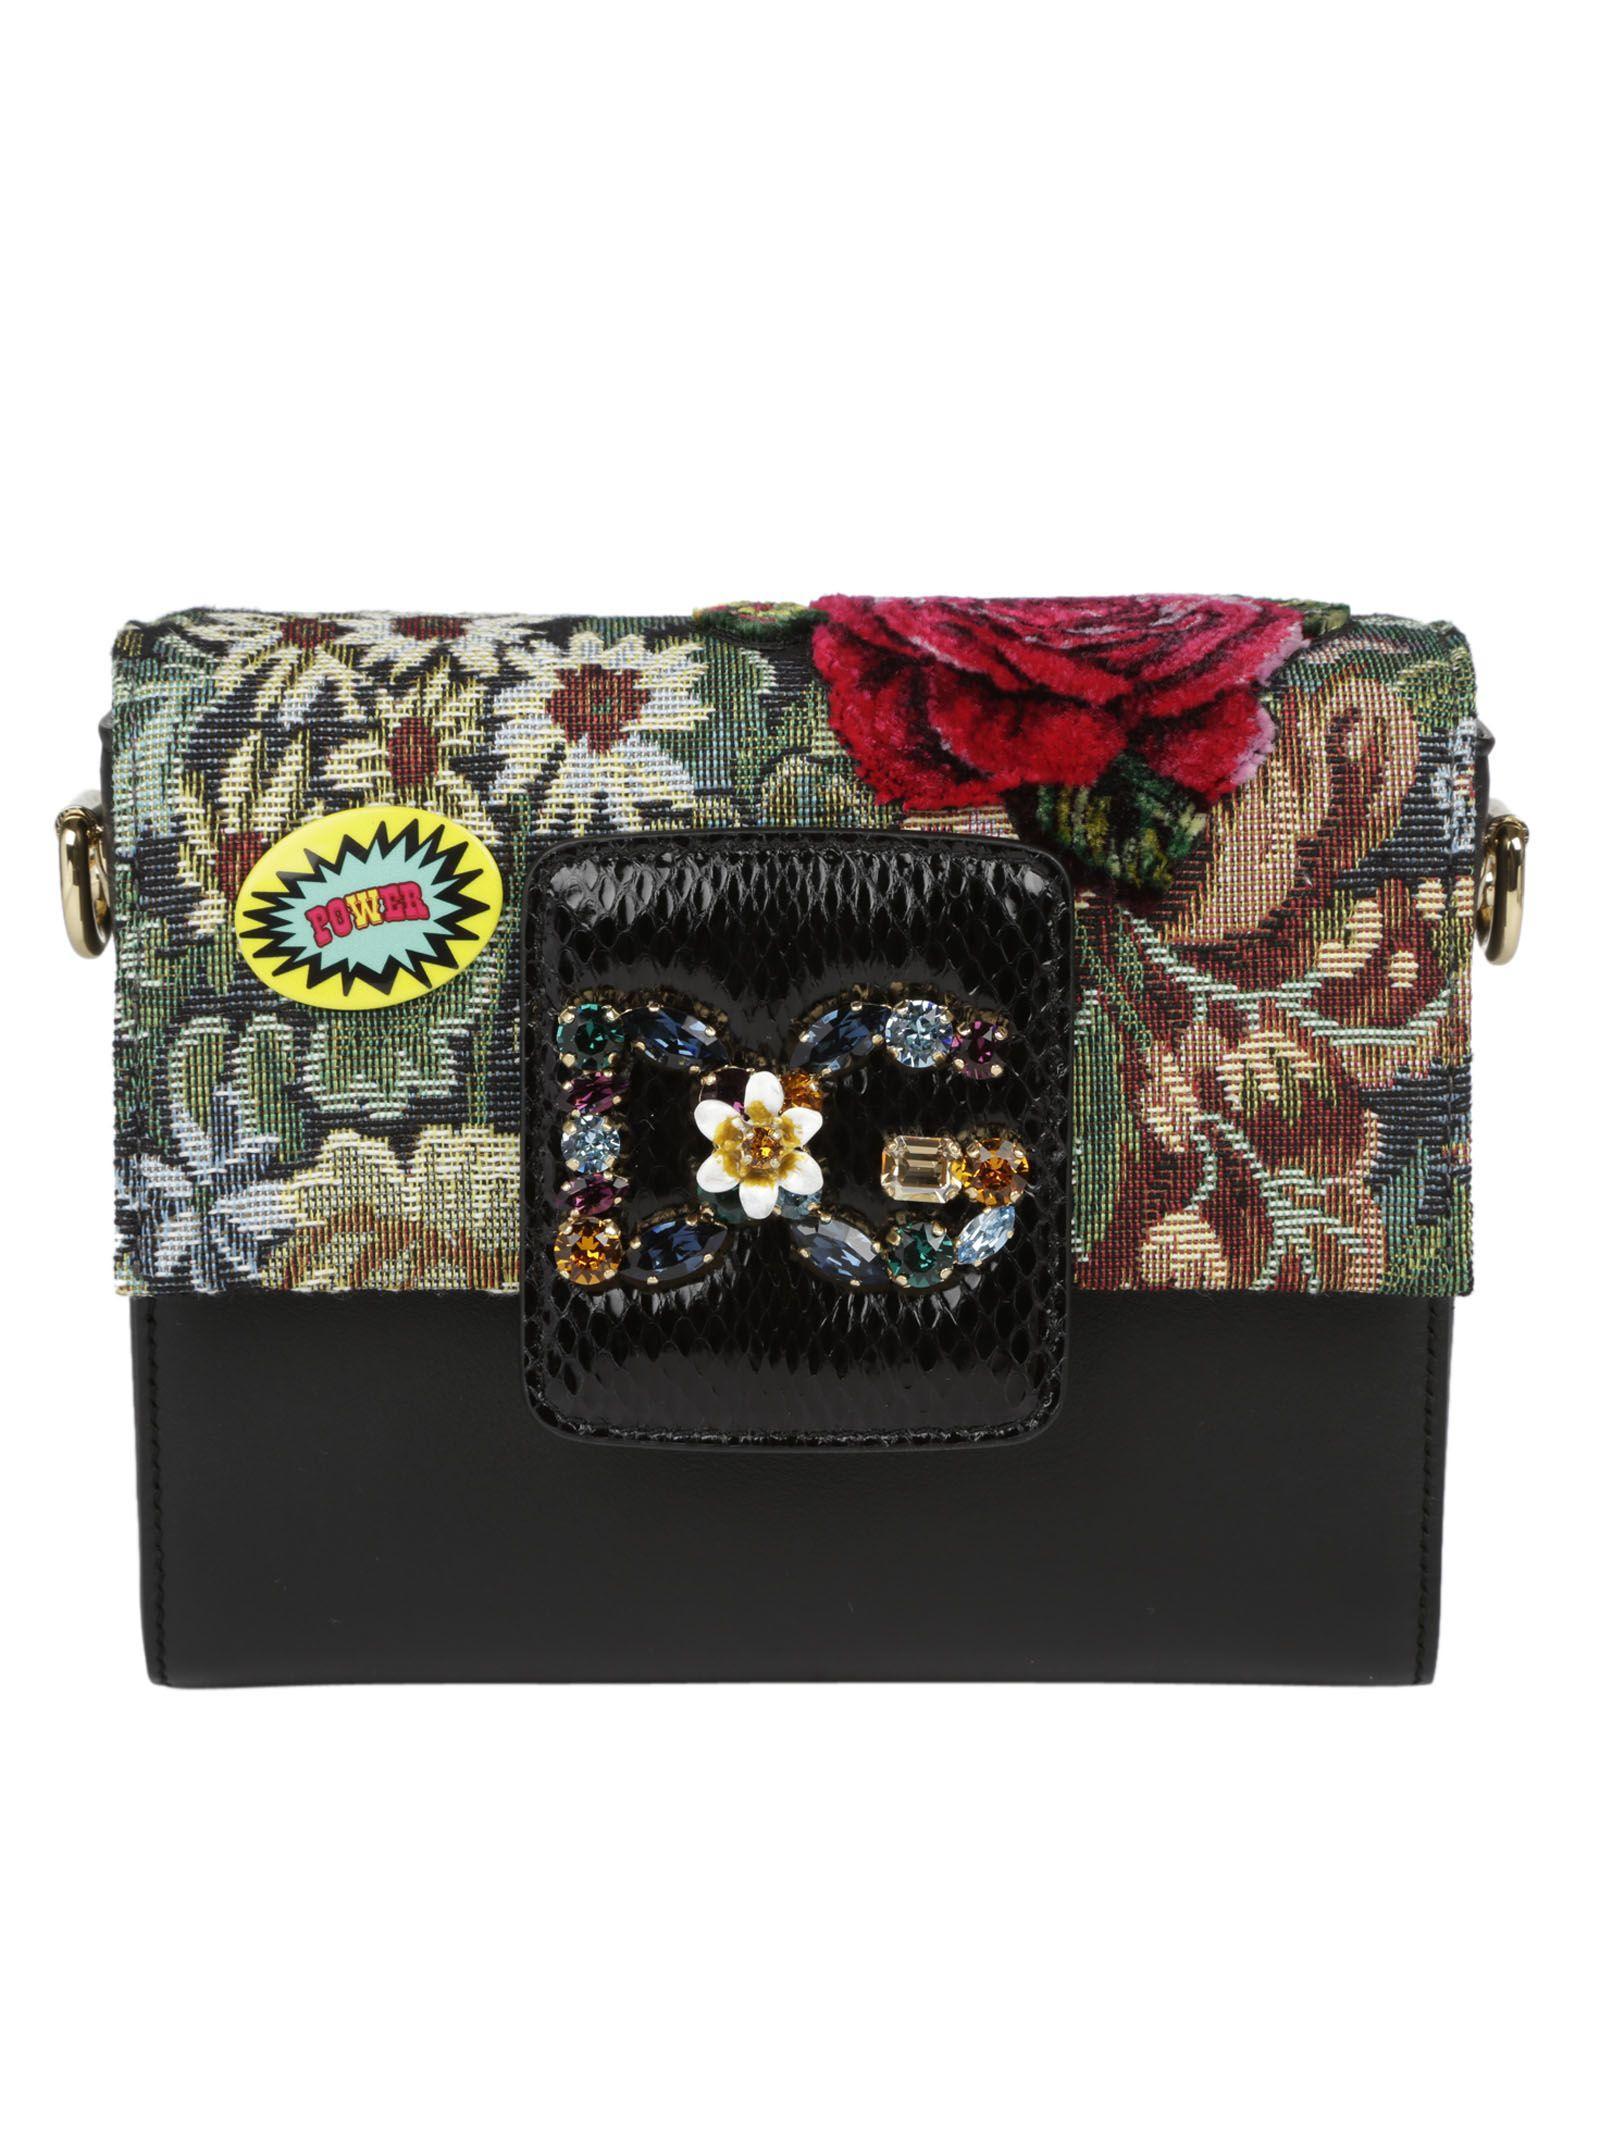 Dolce & Gabbana Millennials Shoulderbag In Multicolor-nero